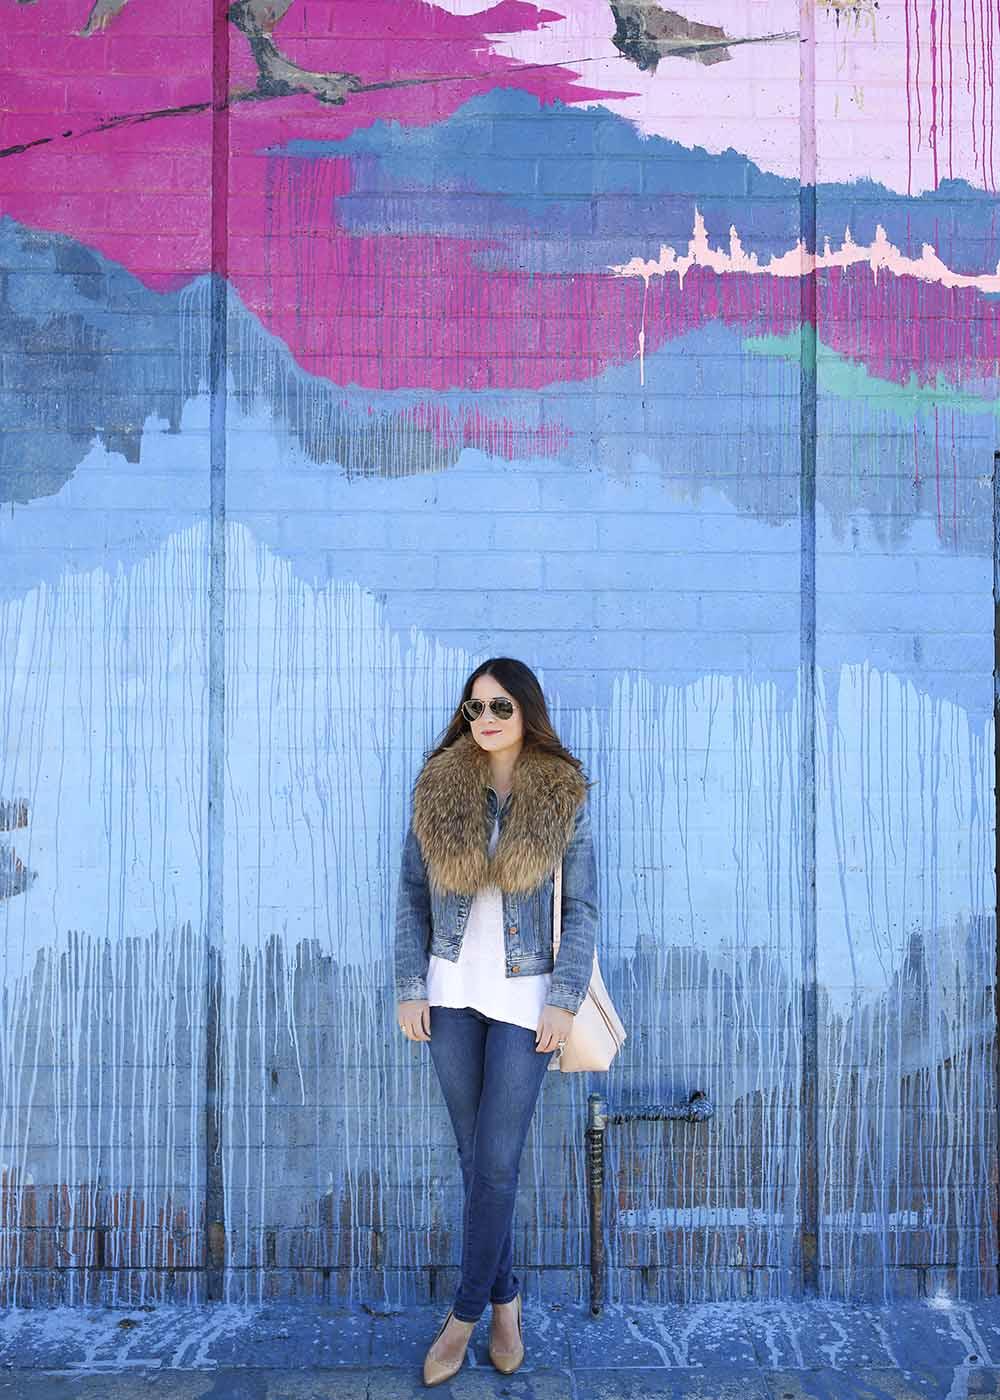 Downtown Los Angeles Street Art